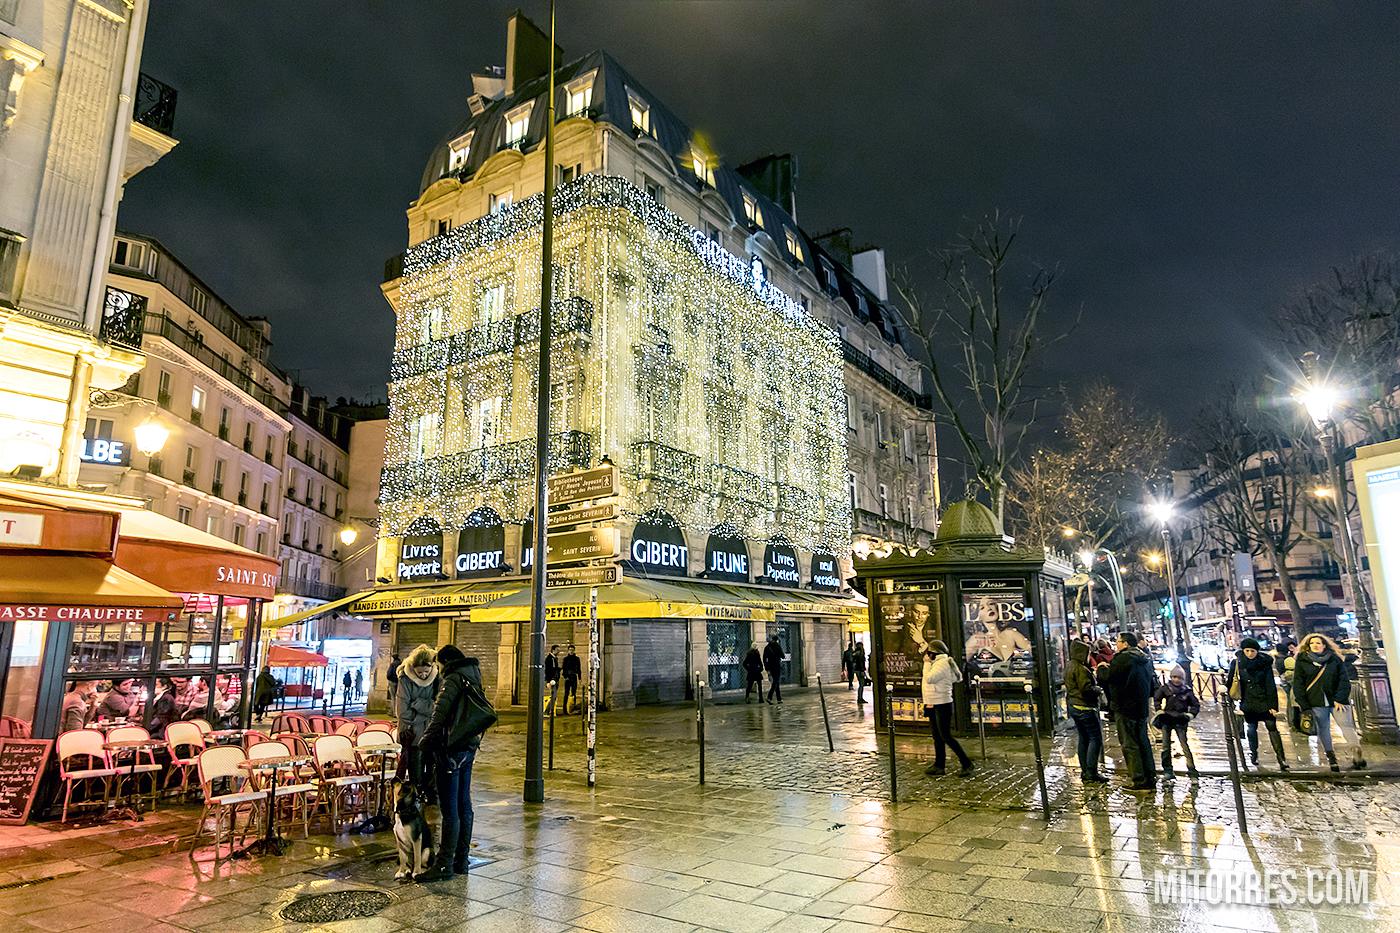 6th arrondissement in Paris, France.